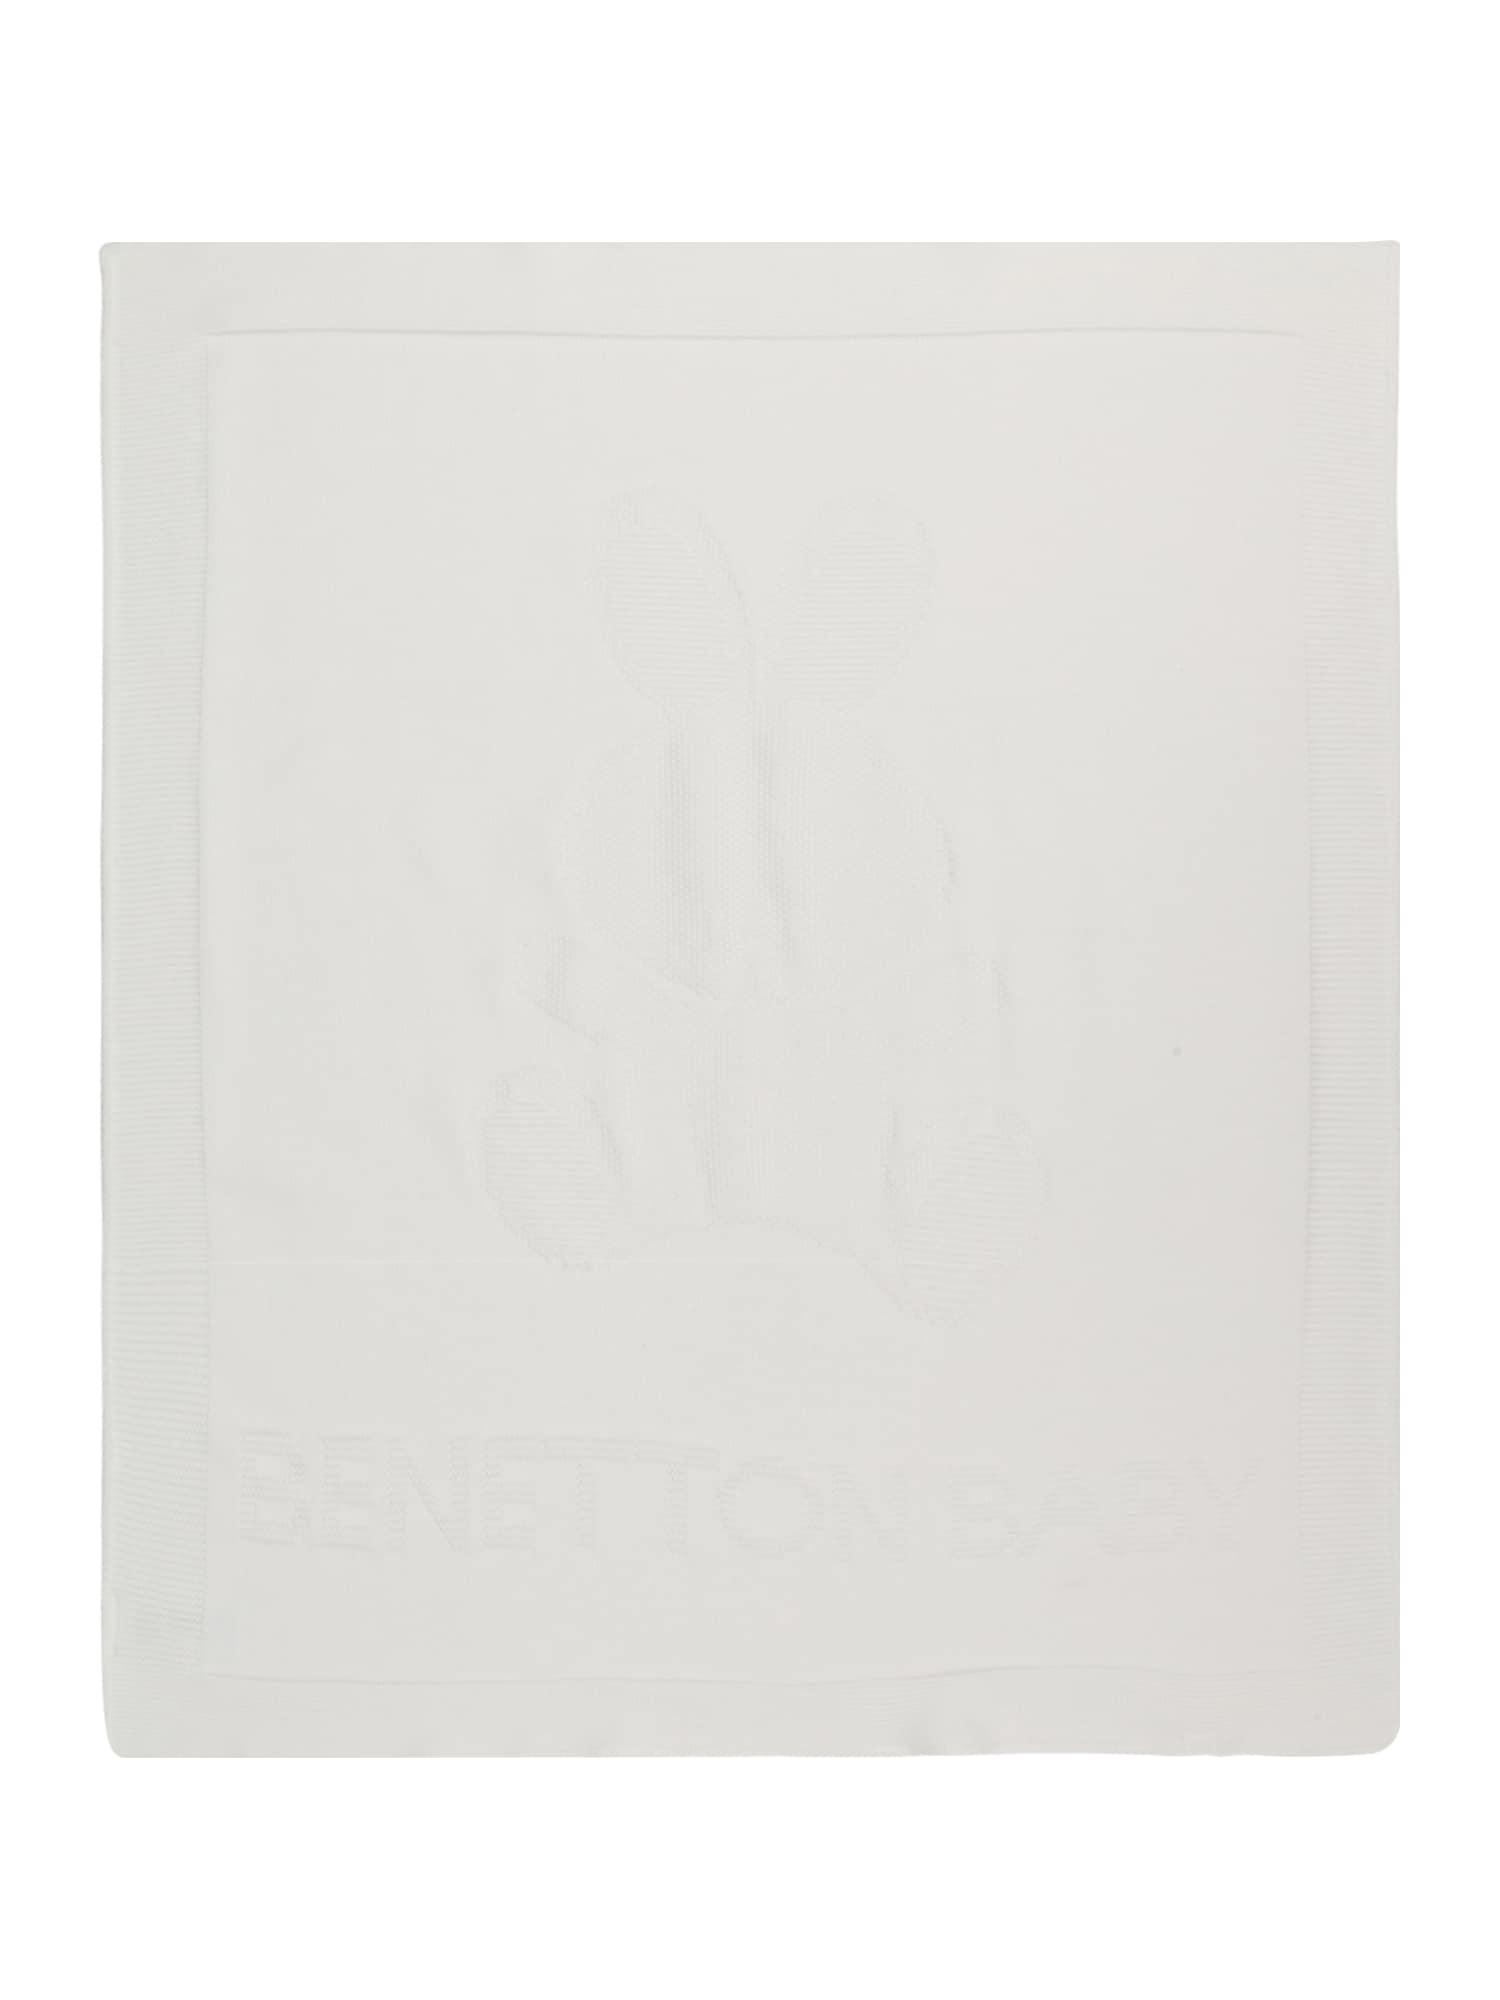 UNITED COLORS OF BENETTON Kūdikio antklodė balta